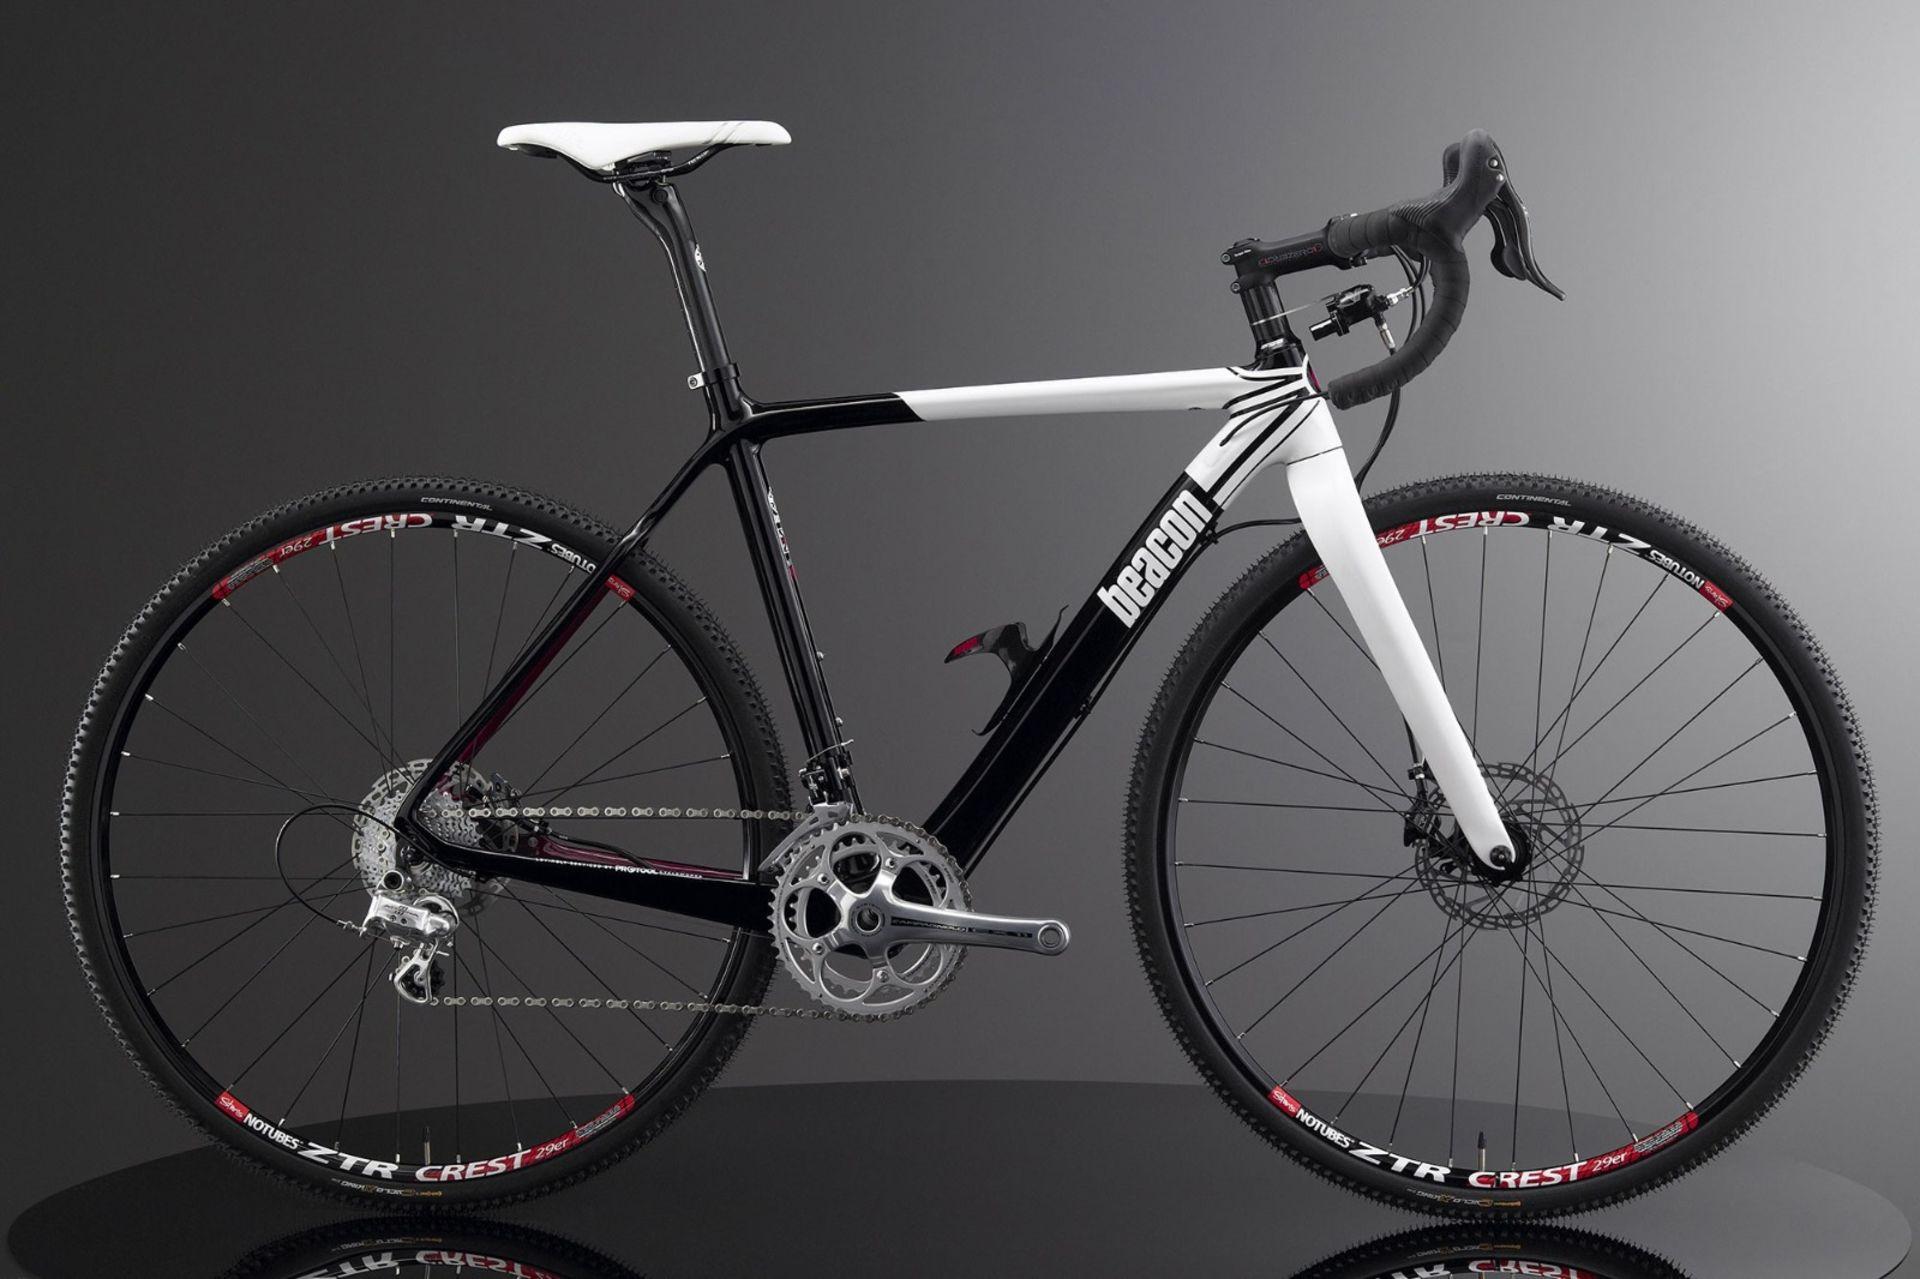 Lot 15 - 1 x Beacon Model BF-45, Size 540, Carbon Fibre Bike Frame in Black & White.